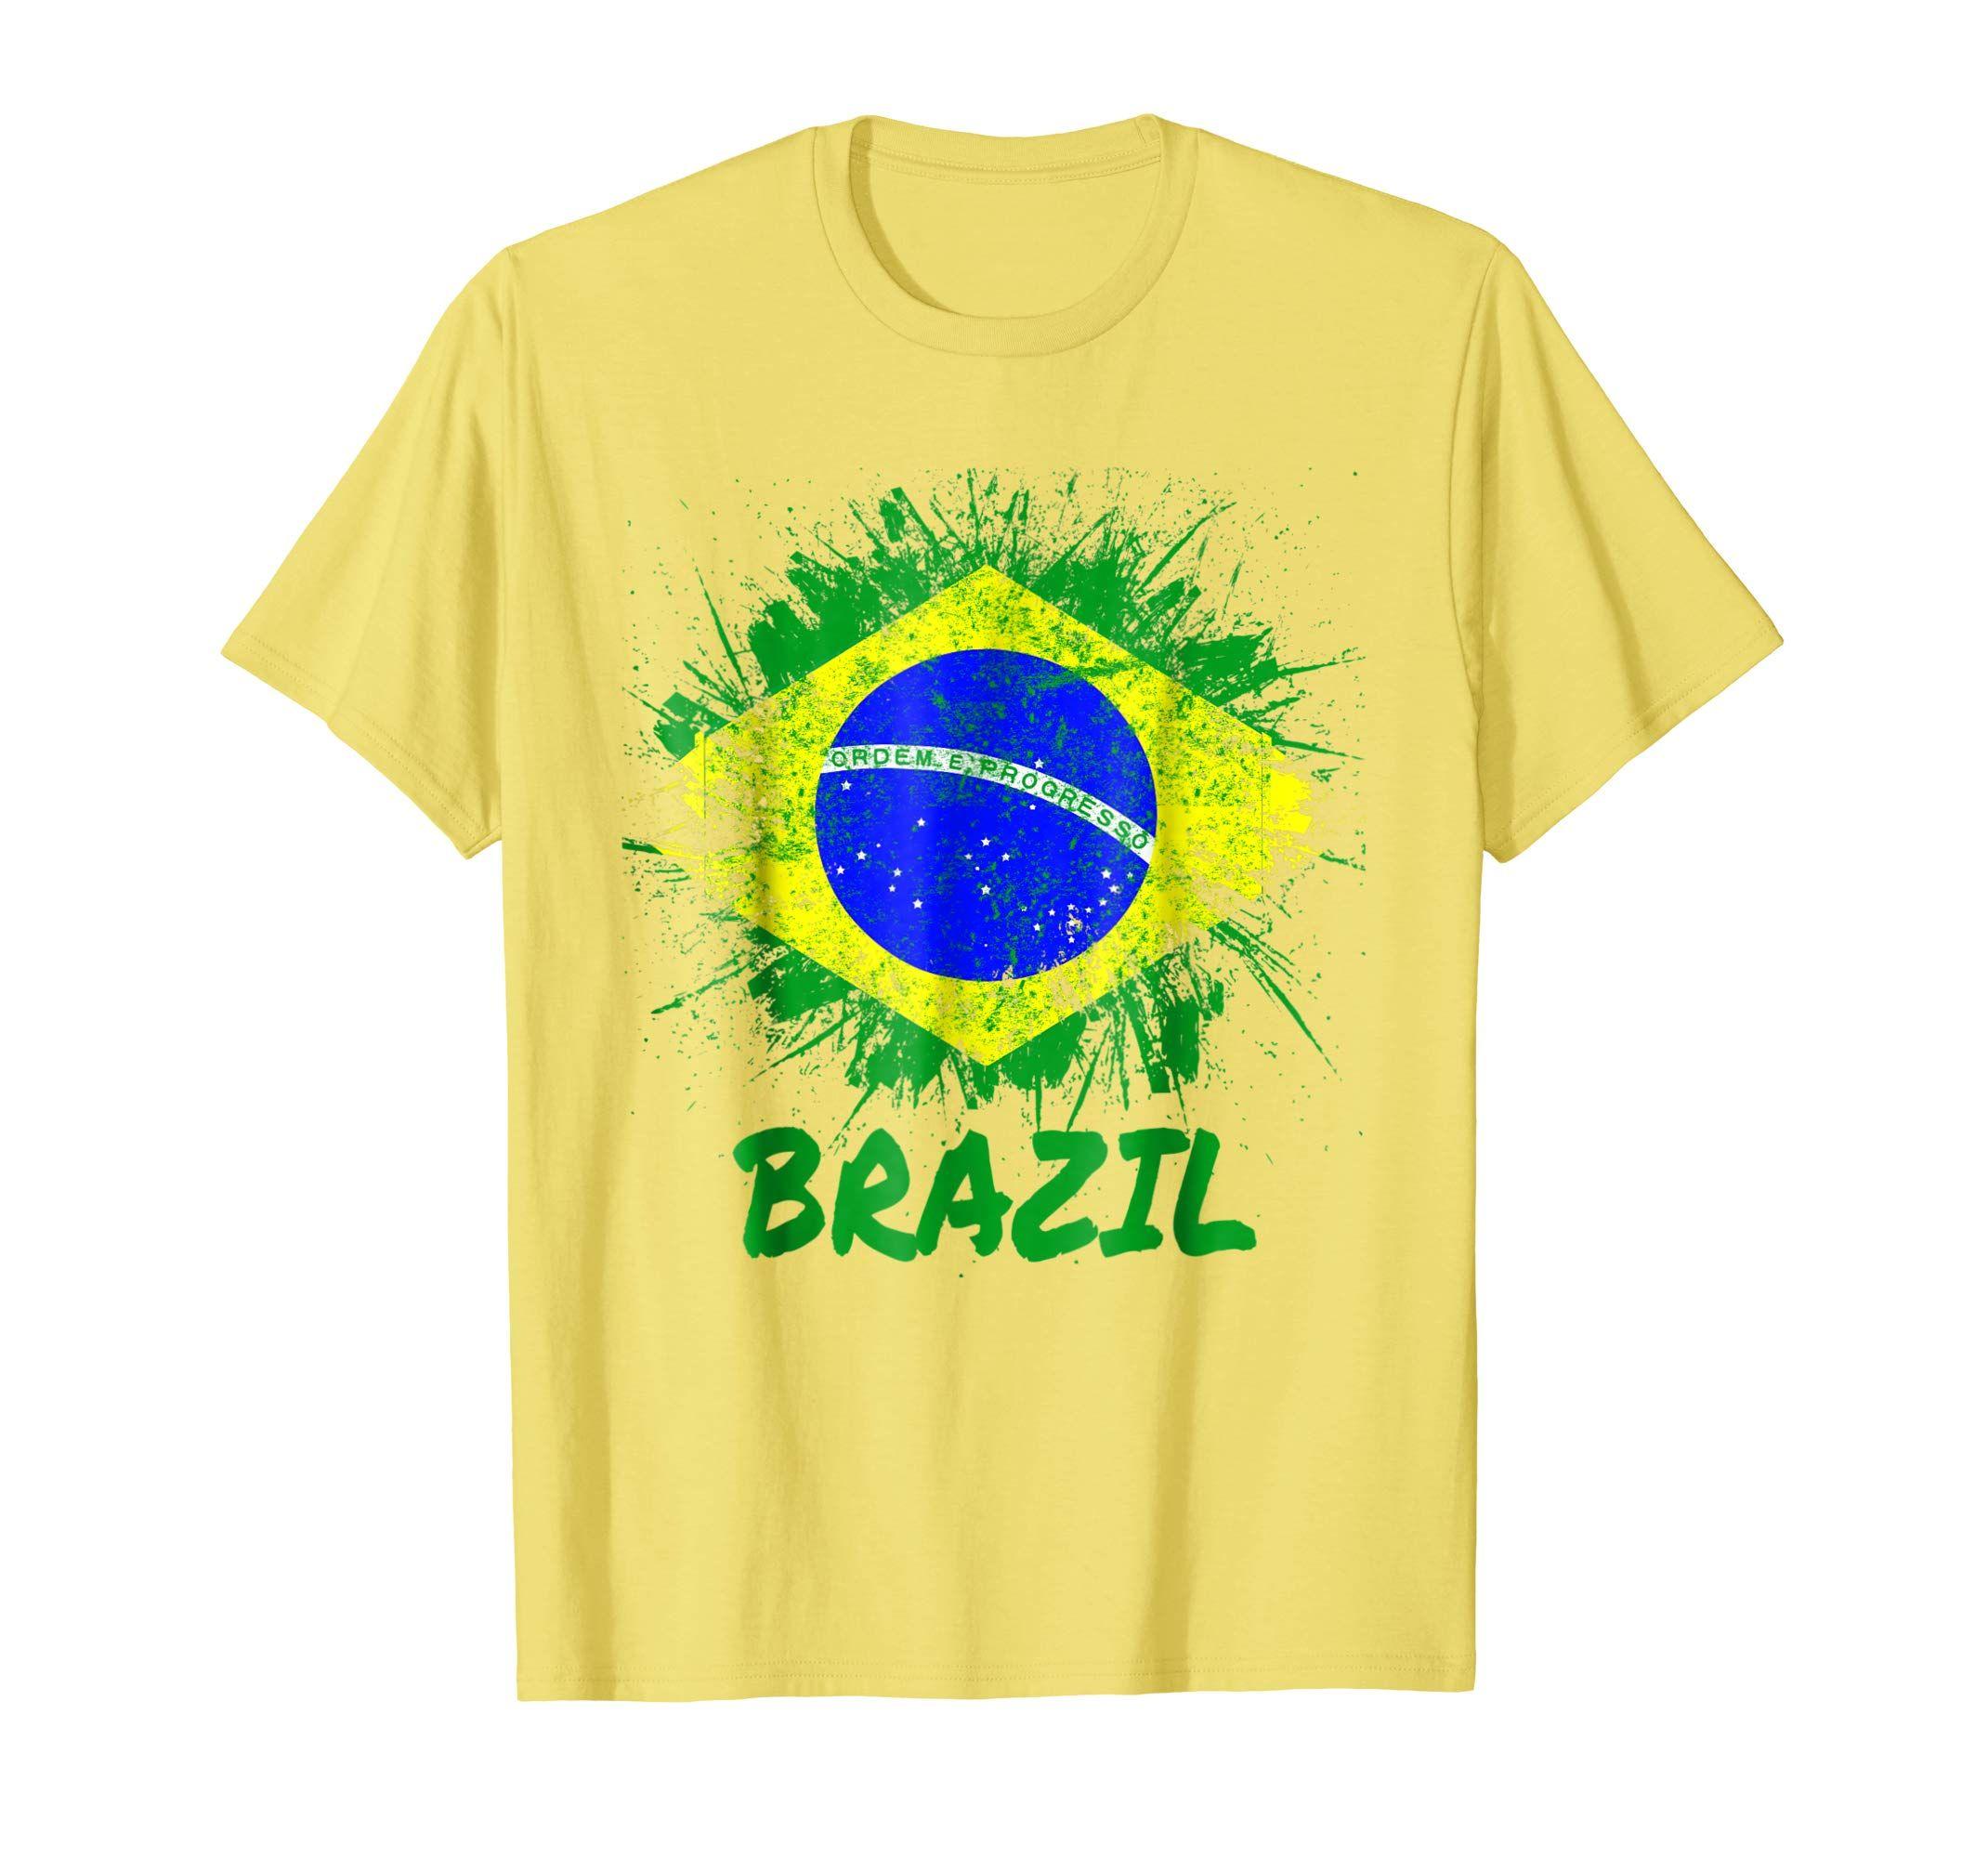 XXXL Mens Womens Brazilian Football Shirt Brazil Retro Yellow S M L XL